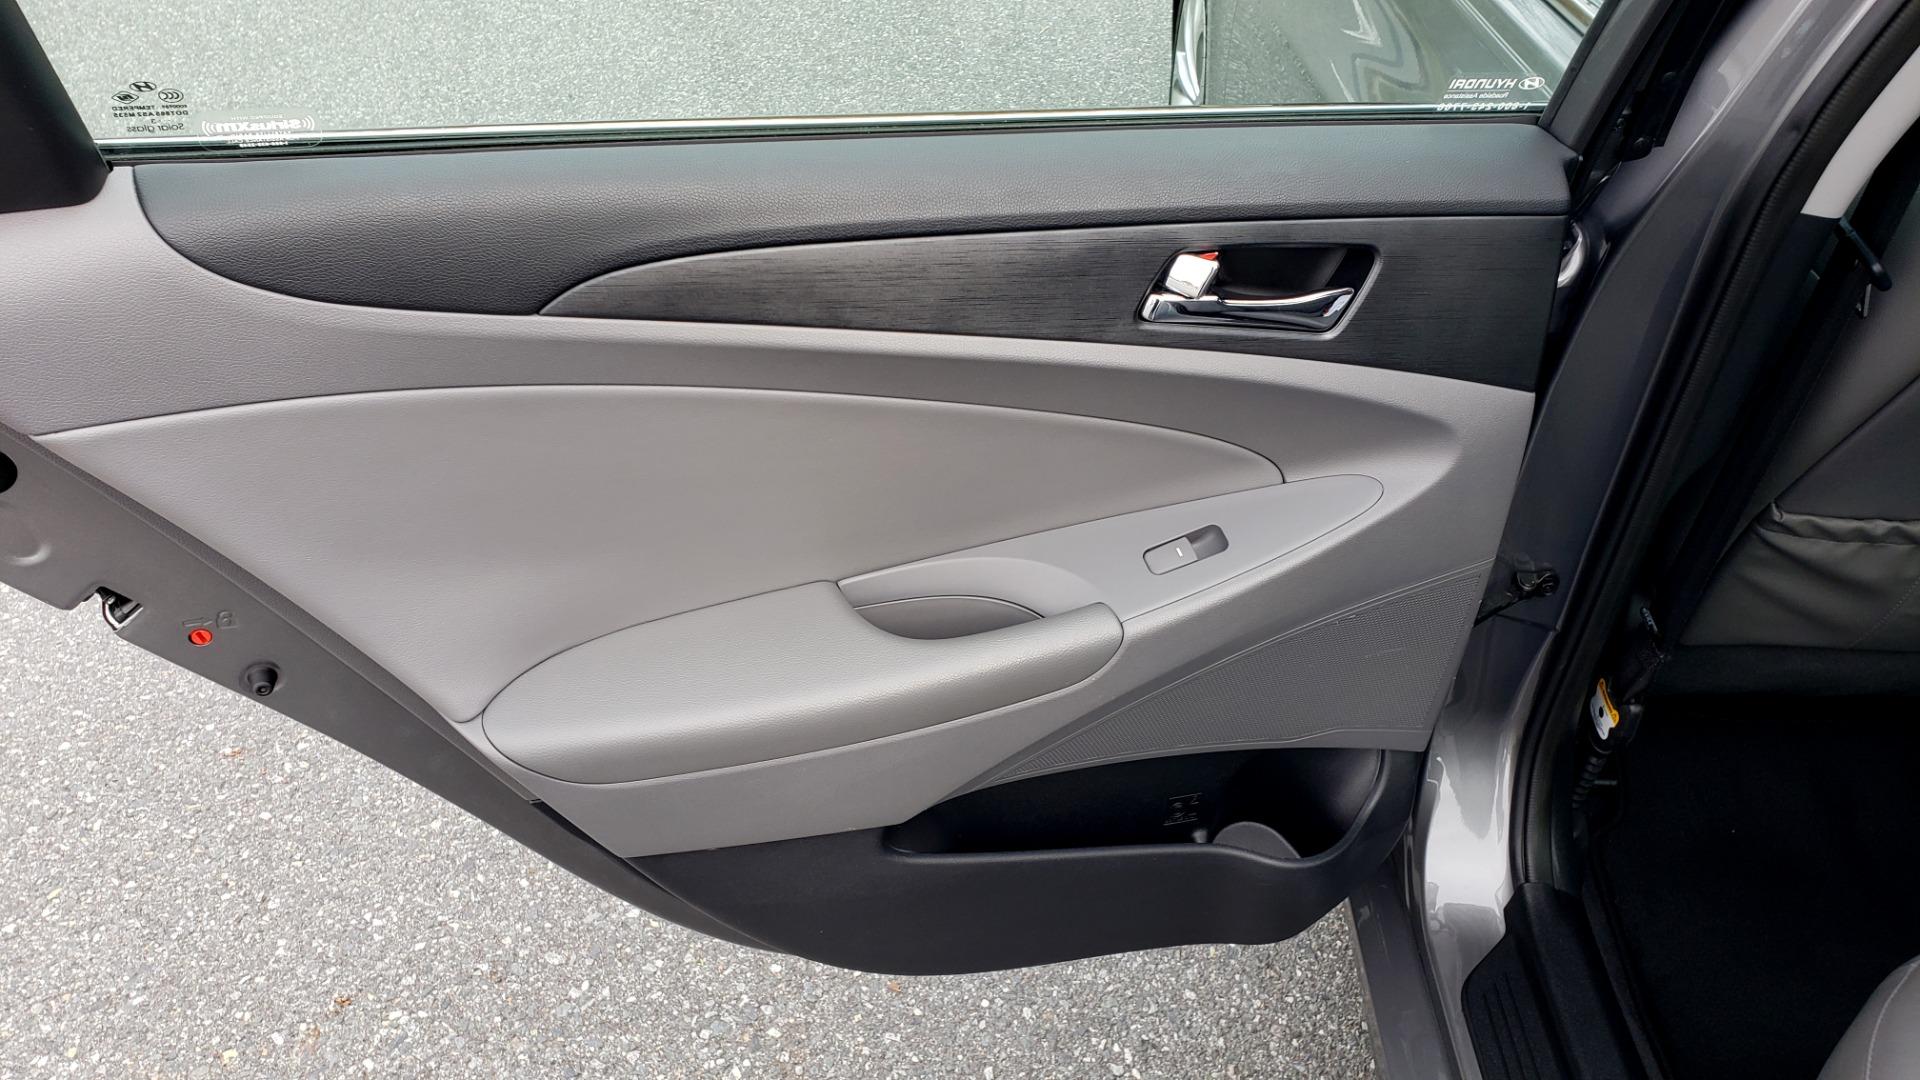 Used 2013 Hyundai SONATA SE AUTO / 2.4L 4-CYL / 6-SPD AUTO / VERY CLEAN for sale Sold at Formula Imports in Charlotte NC 28227 53